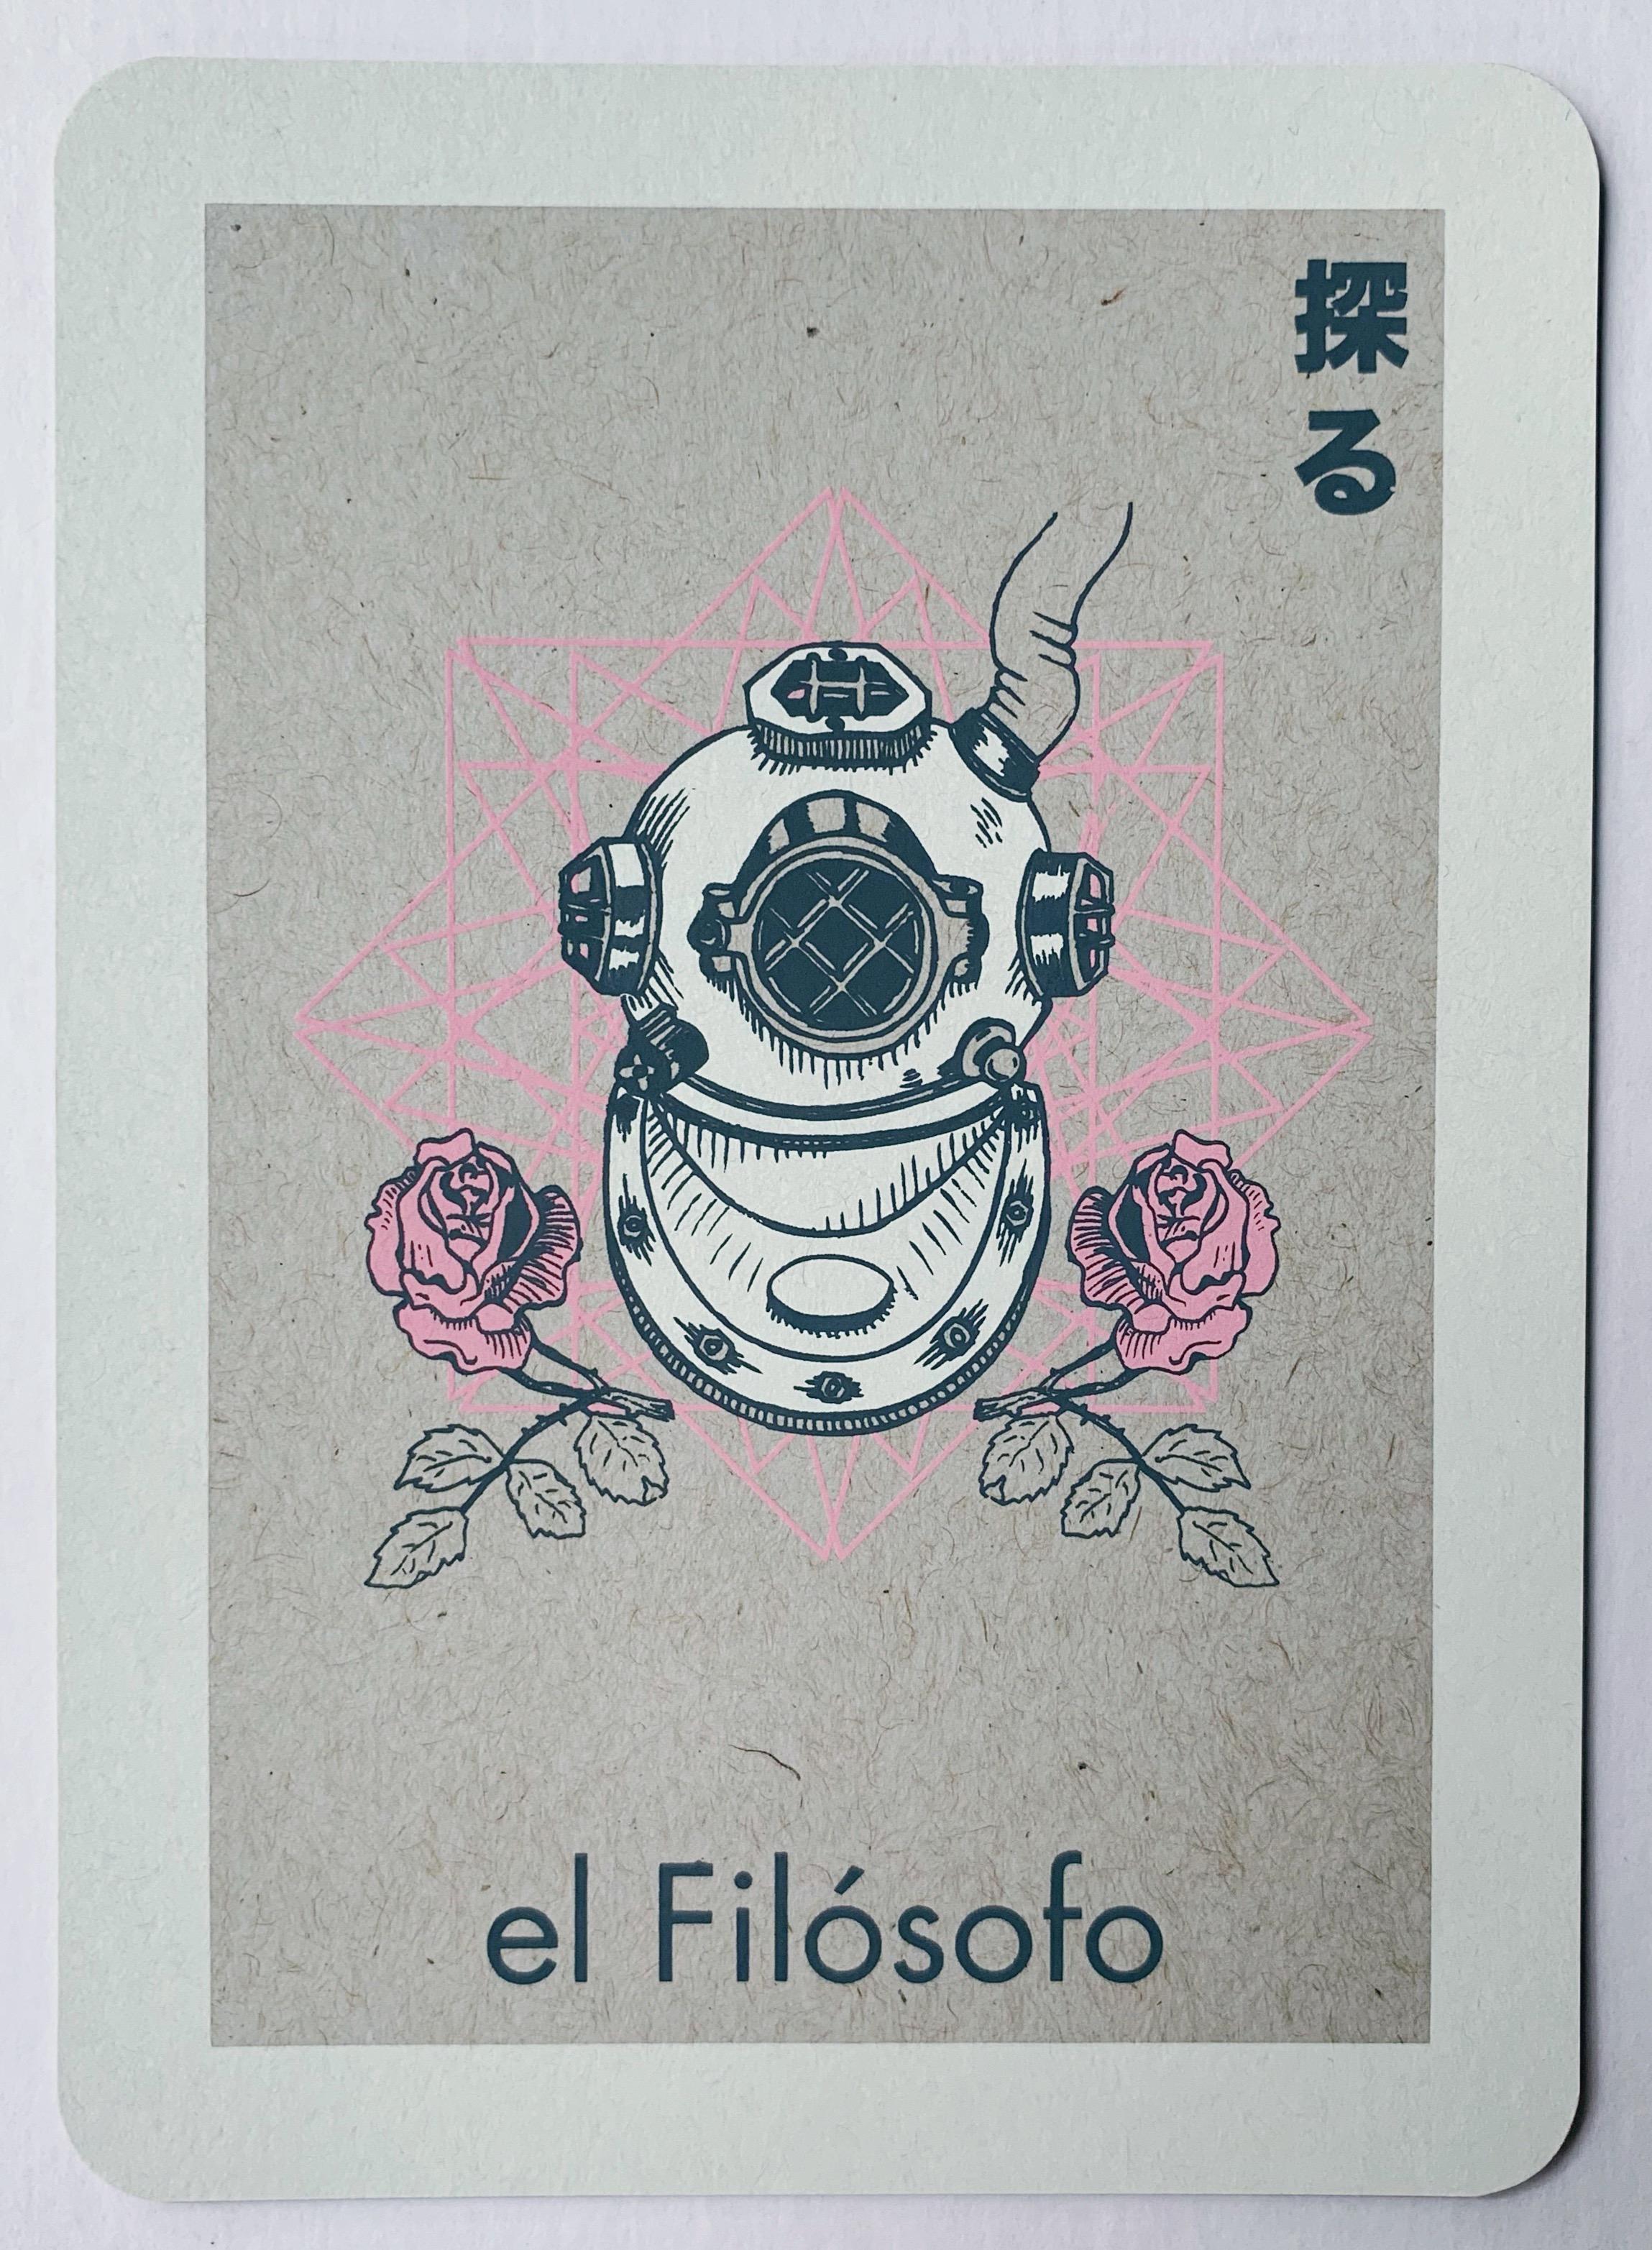 el Filósofo, serigraphy, 2017